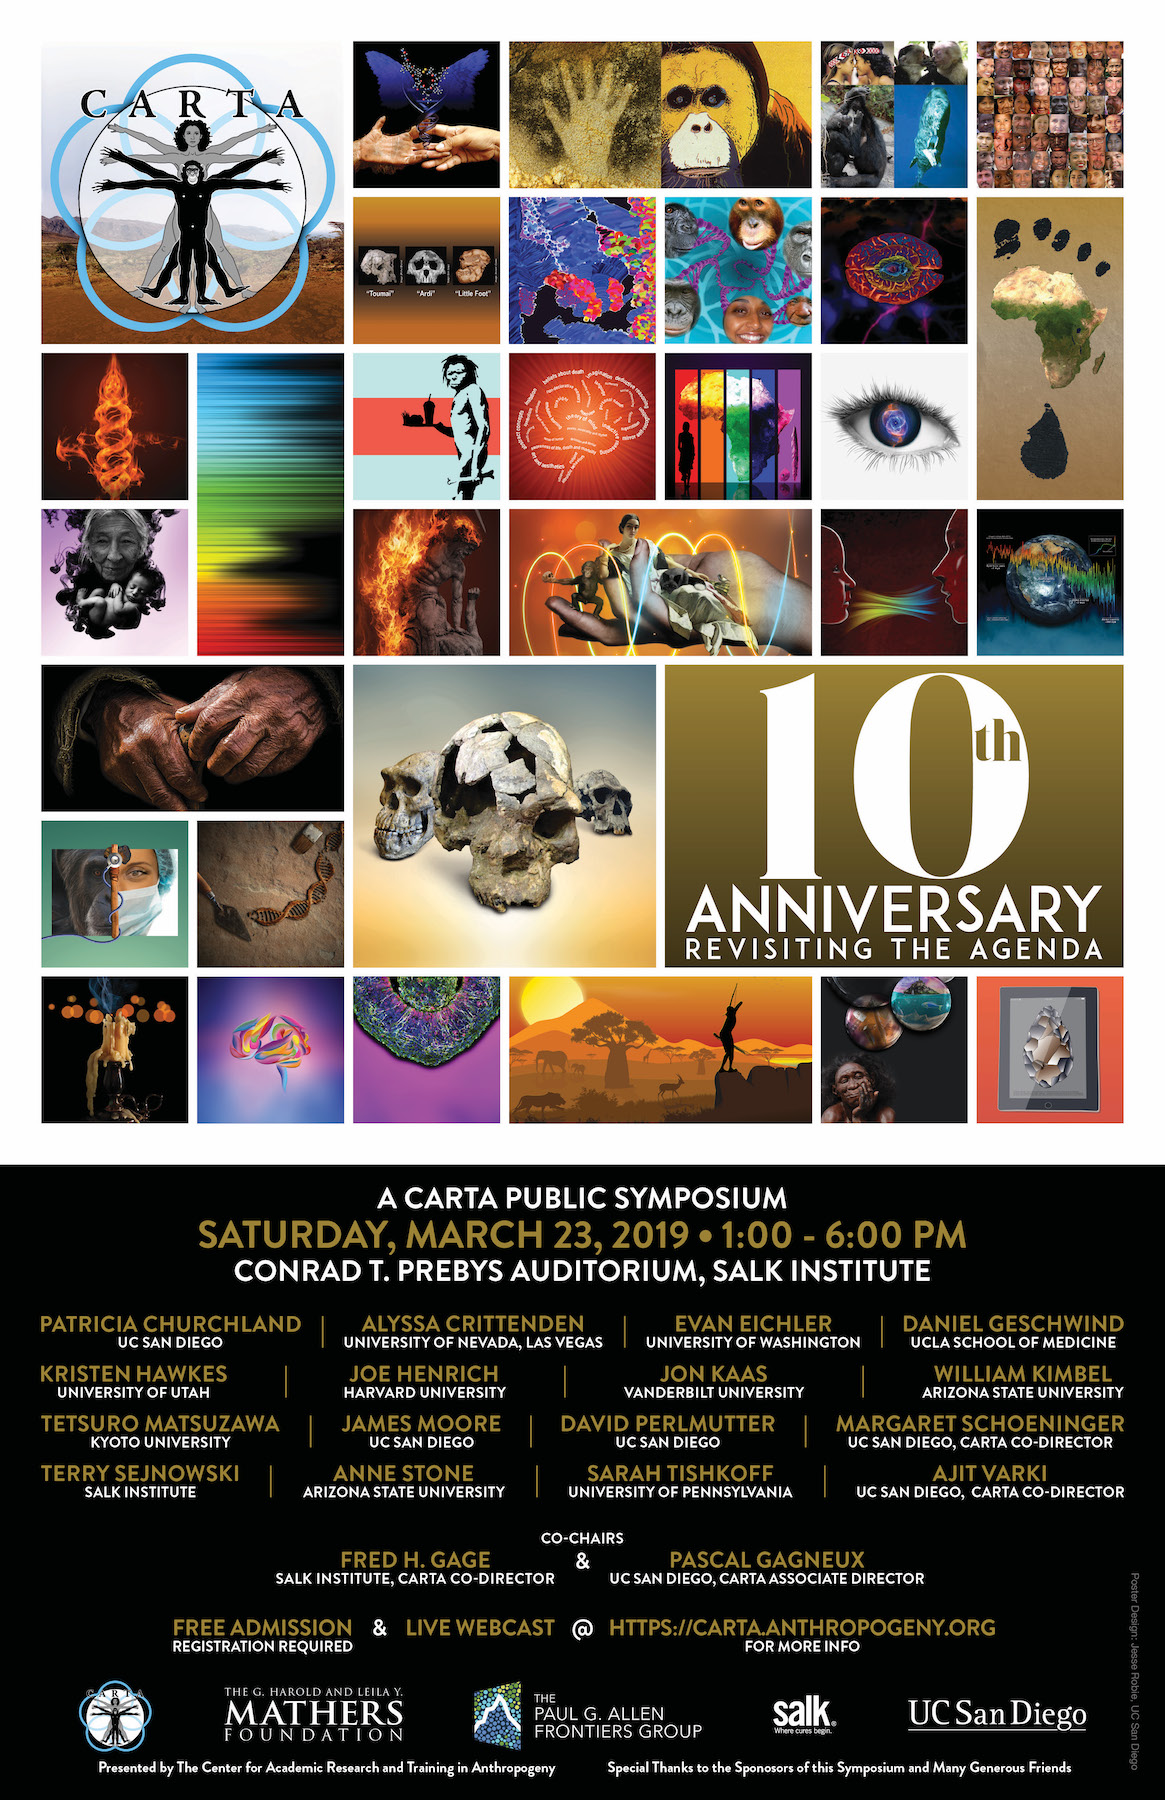 Ucsd Academic Calendar 2019.Carta 10th Anniversary Revisiting The Agenda Symposium